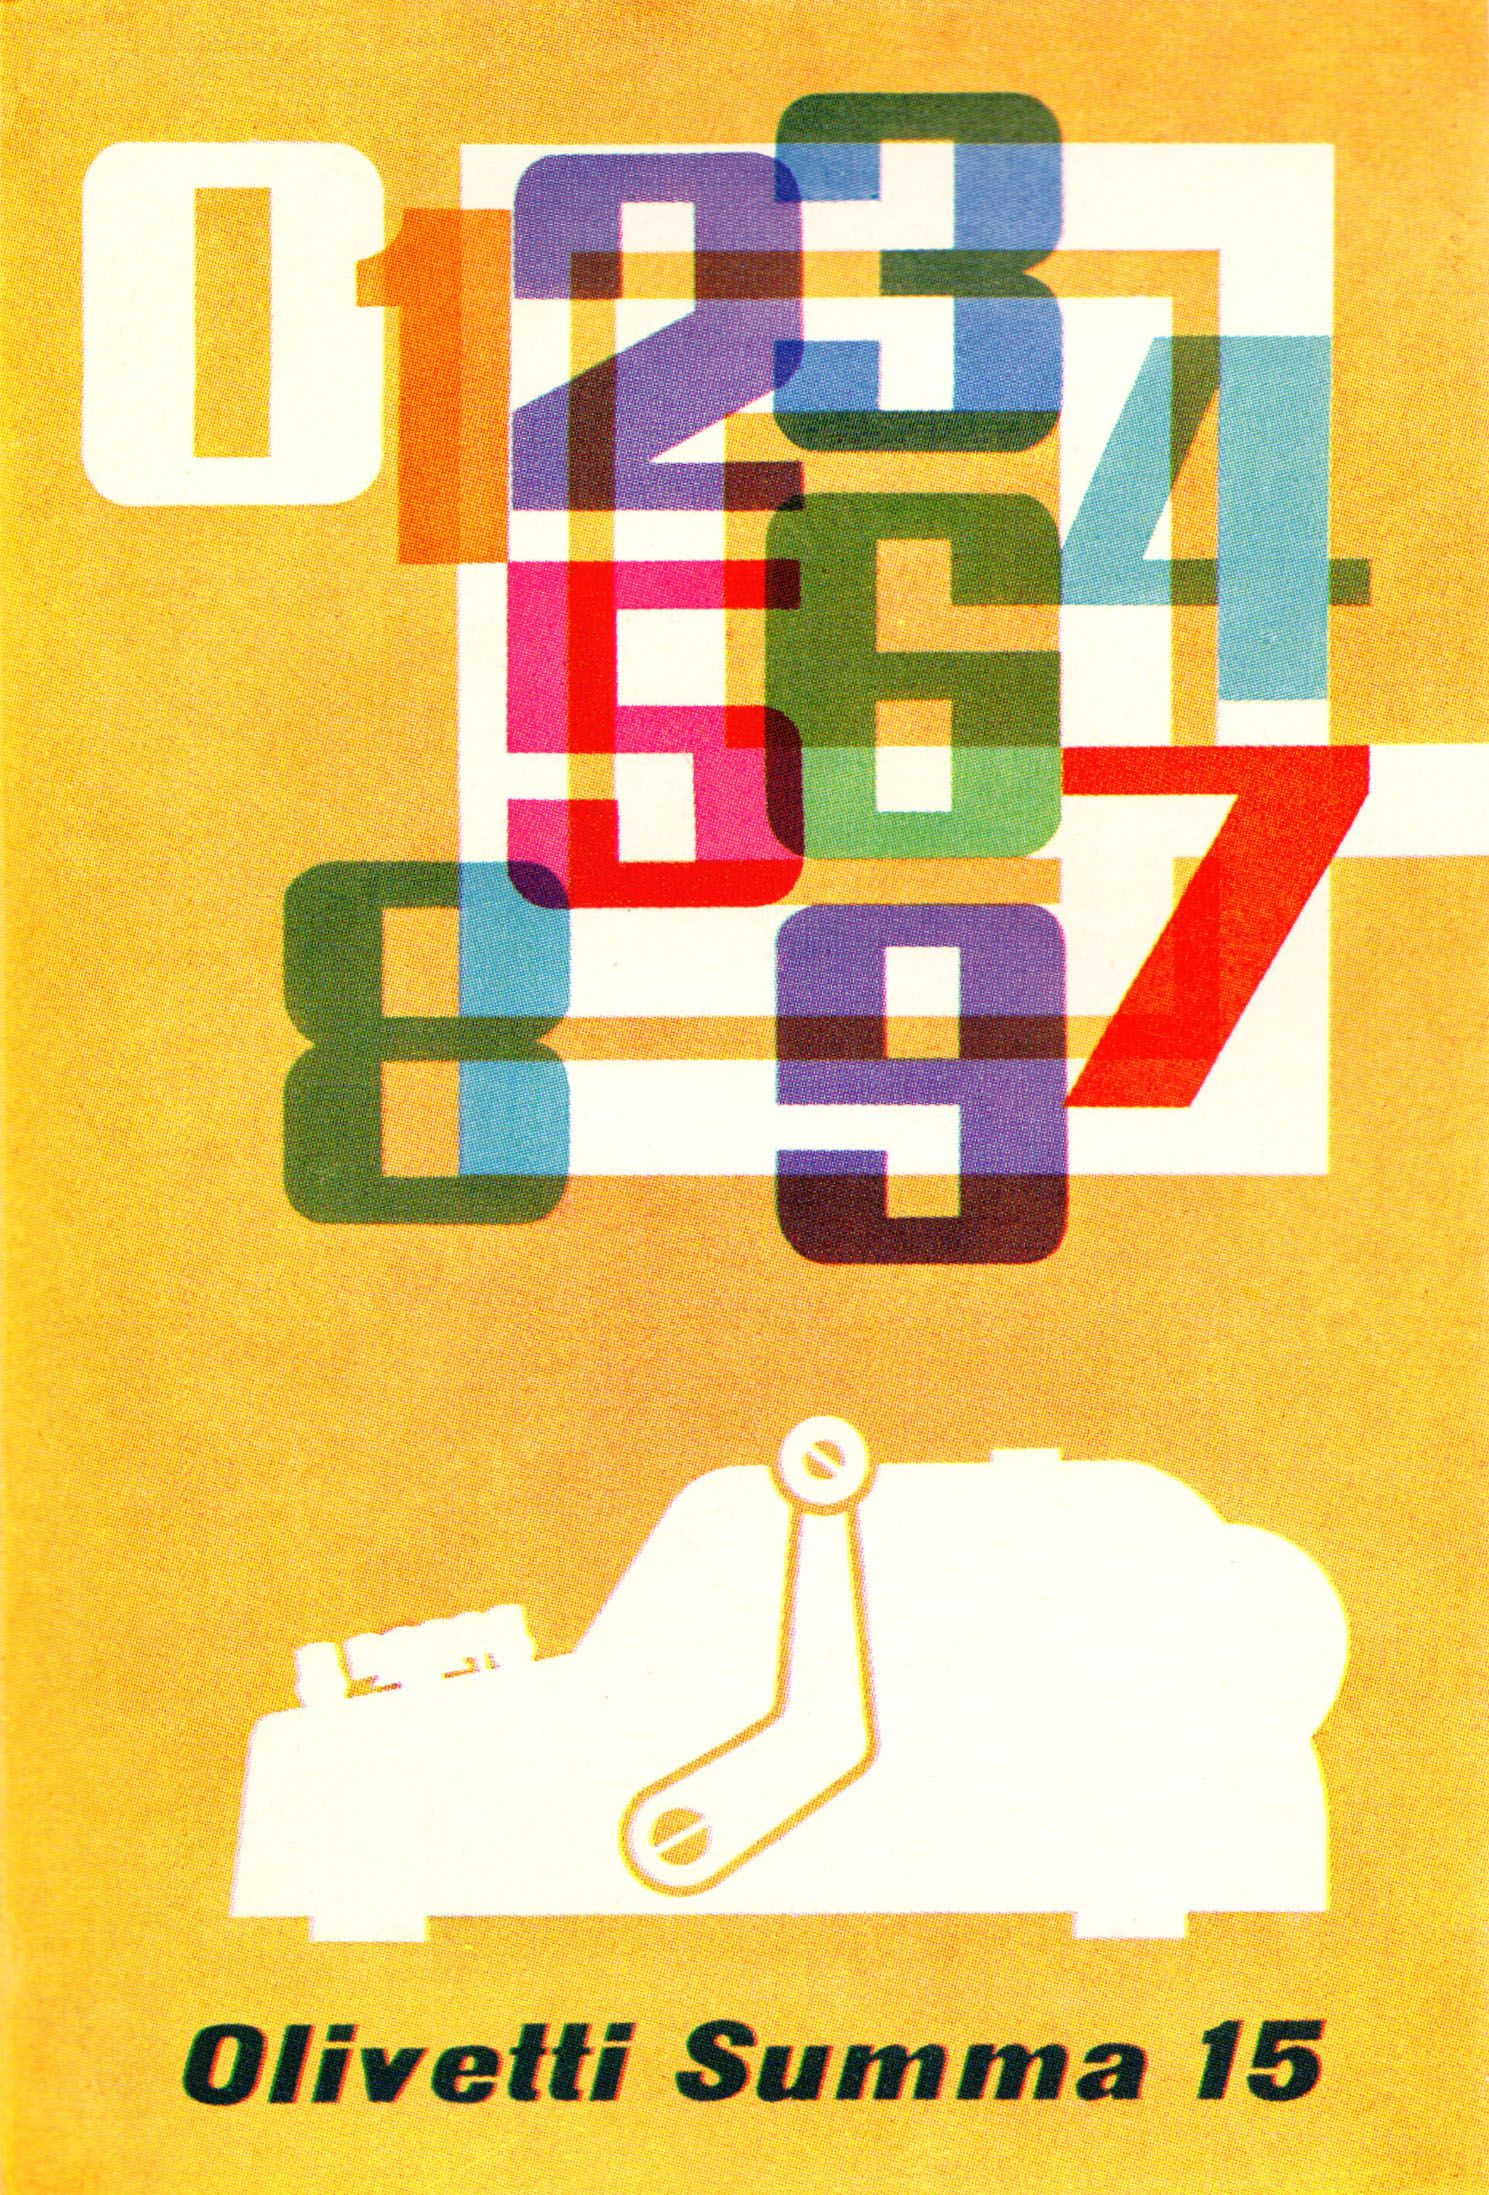 mid century modern Olivetti ad - Google Search